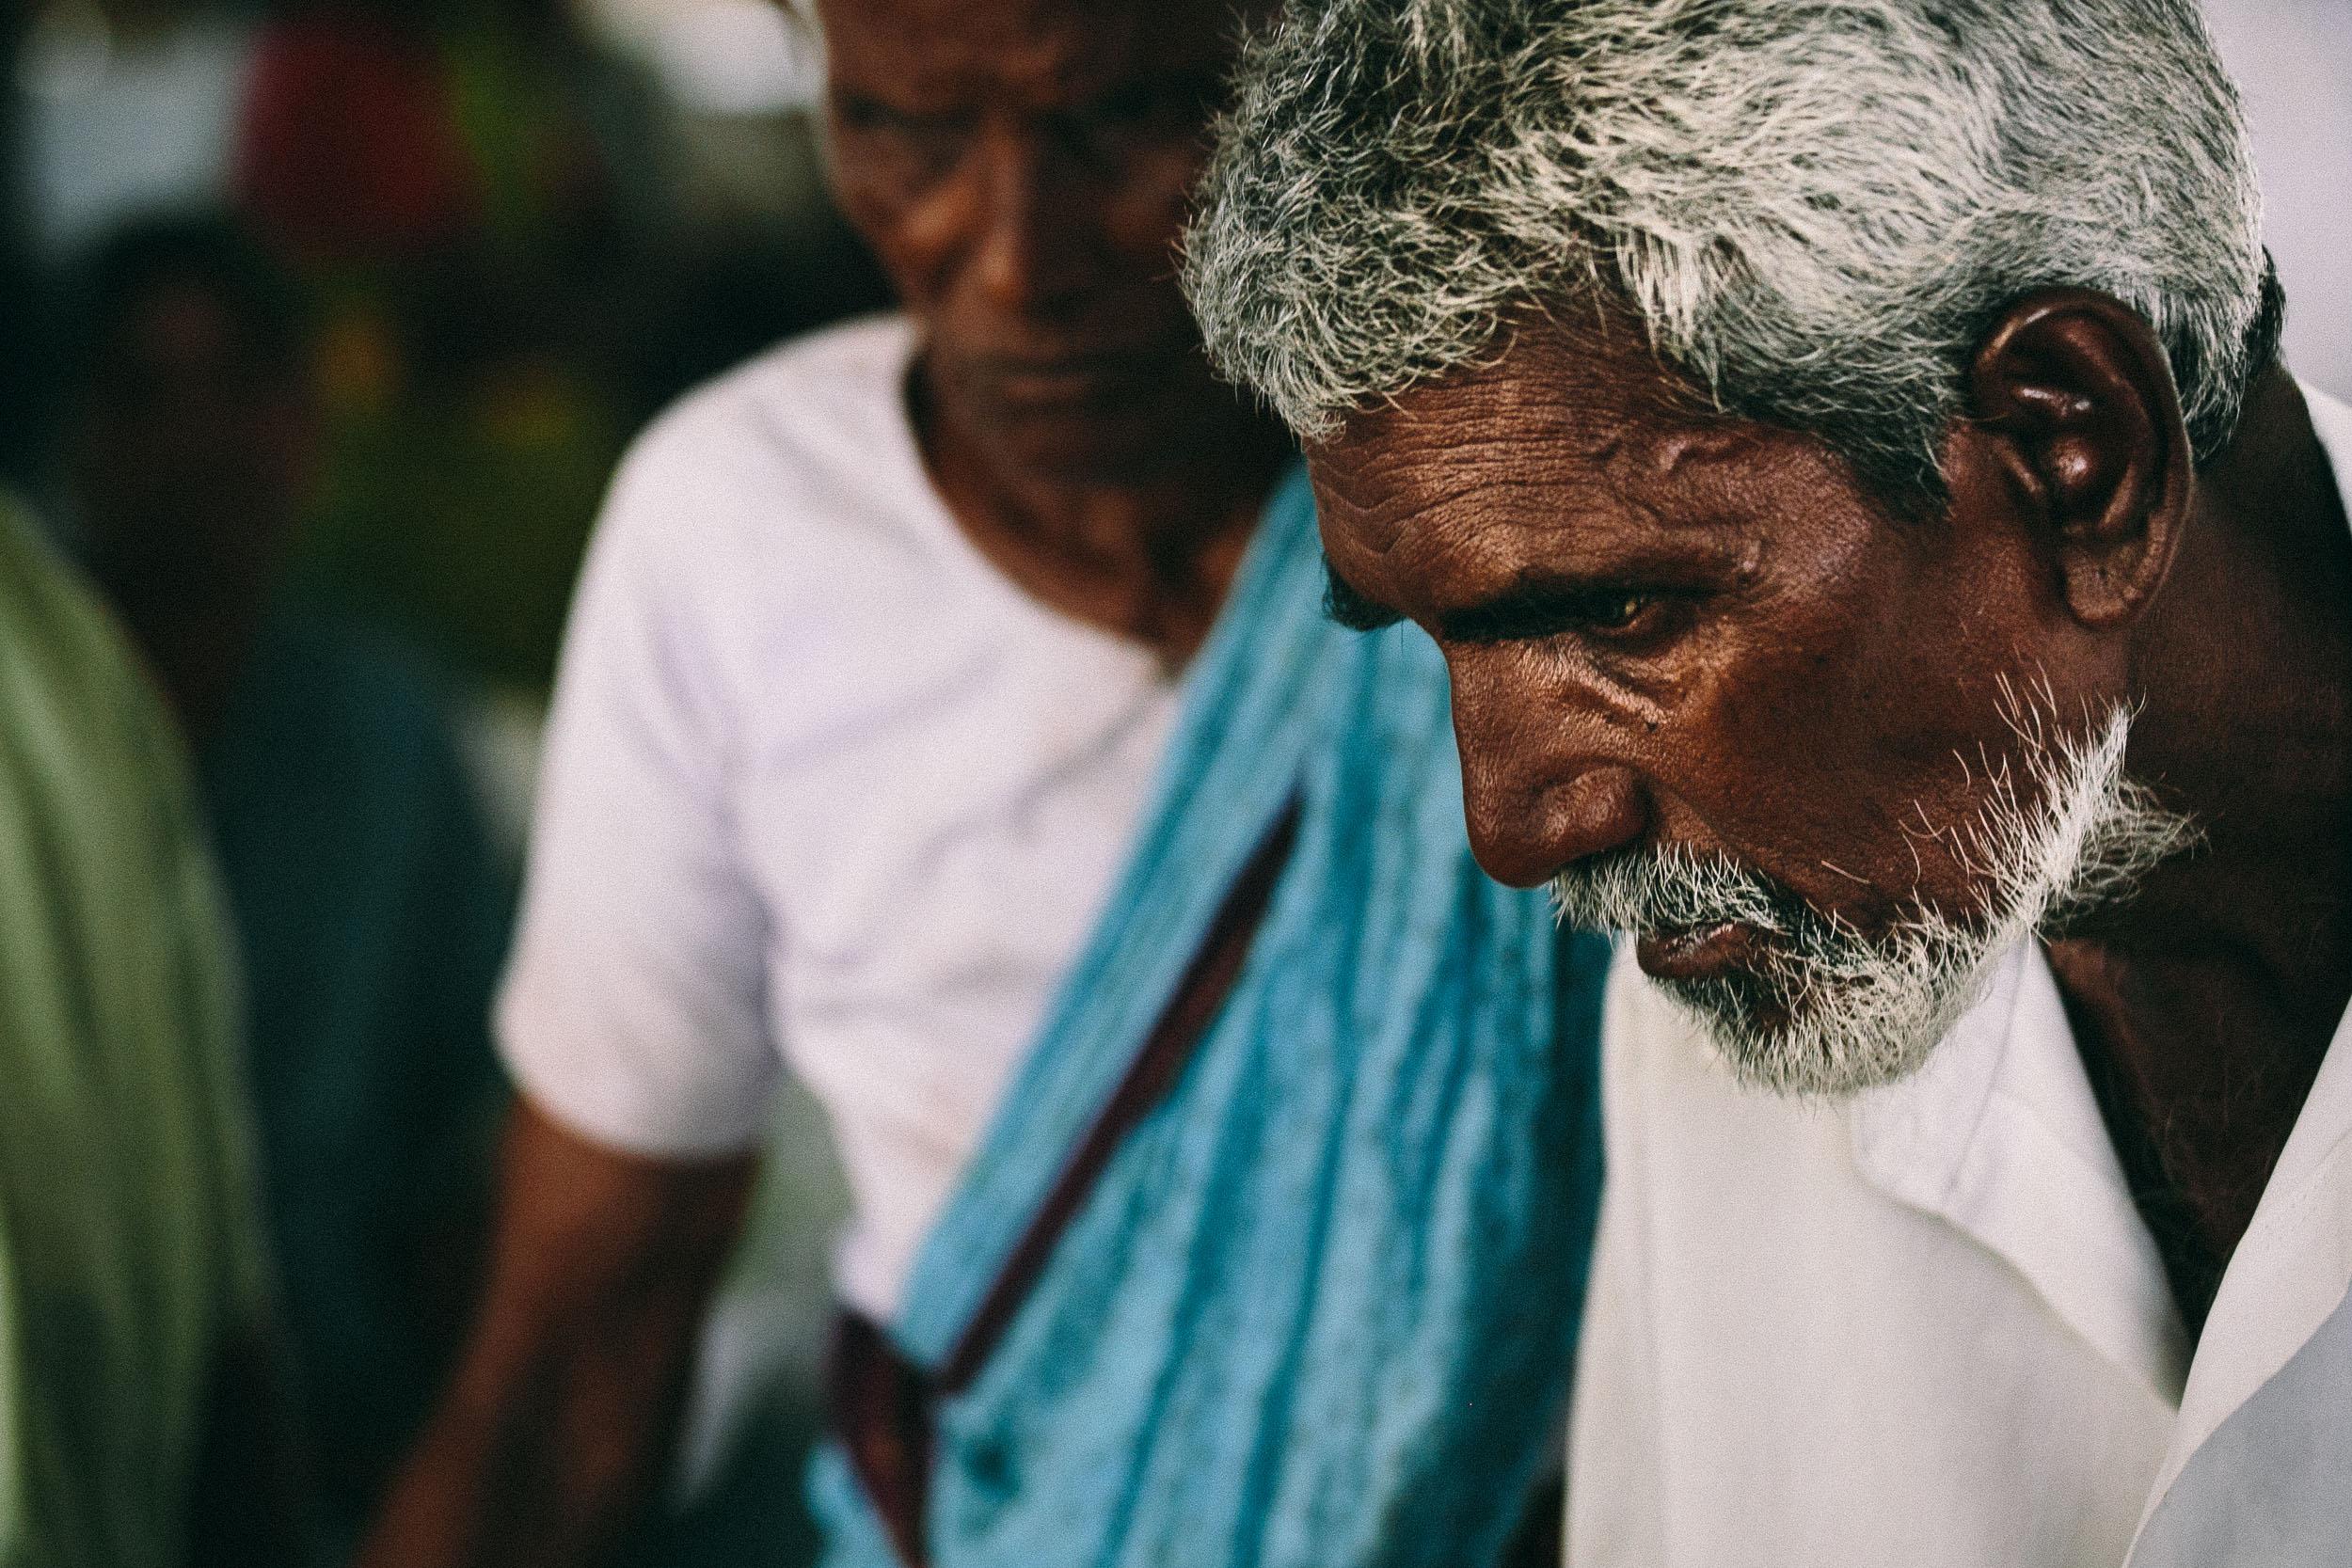 brian-callaway-india-photography-aravind-eye-hospital-26.jpg